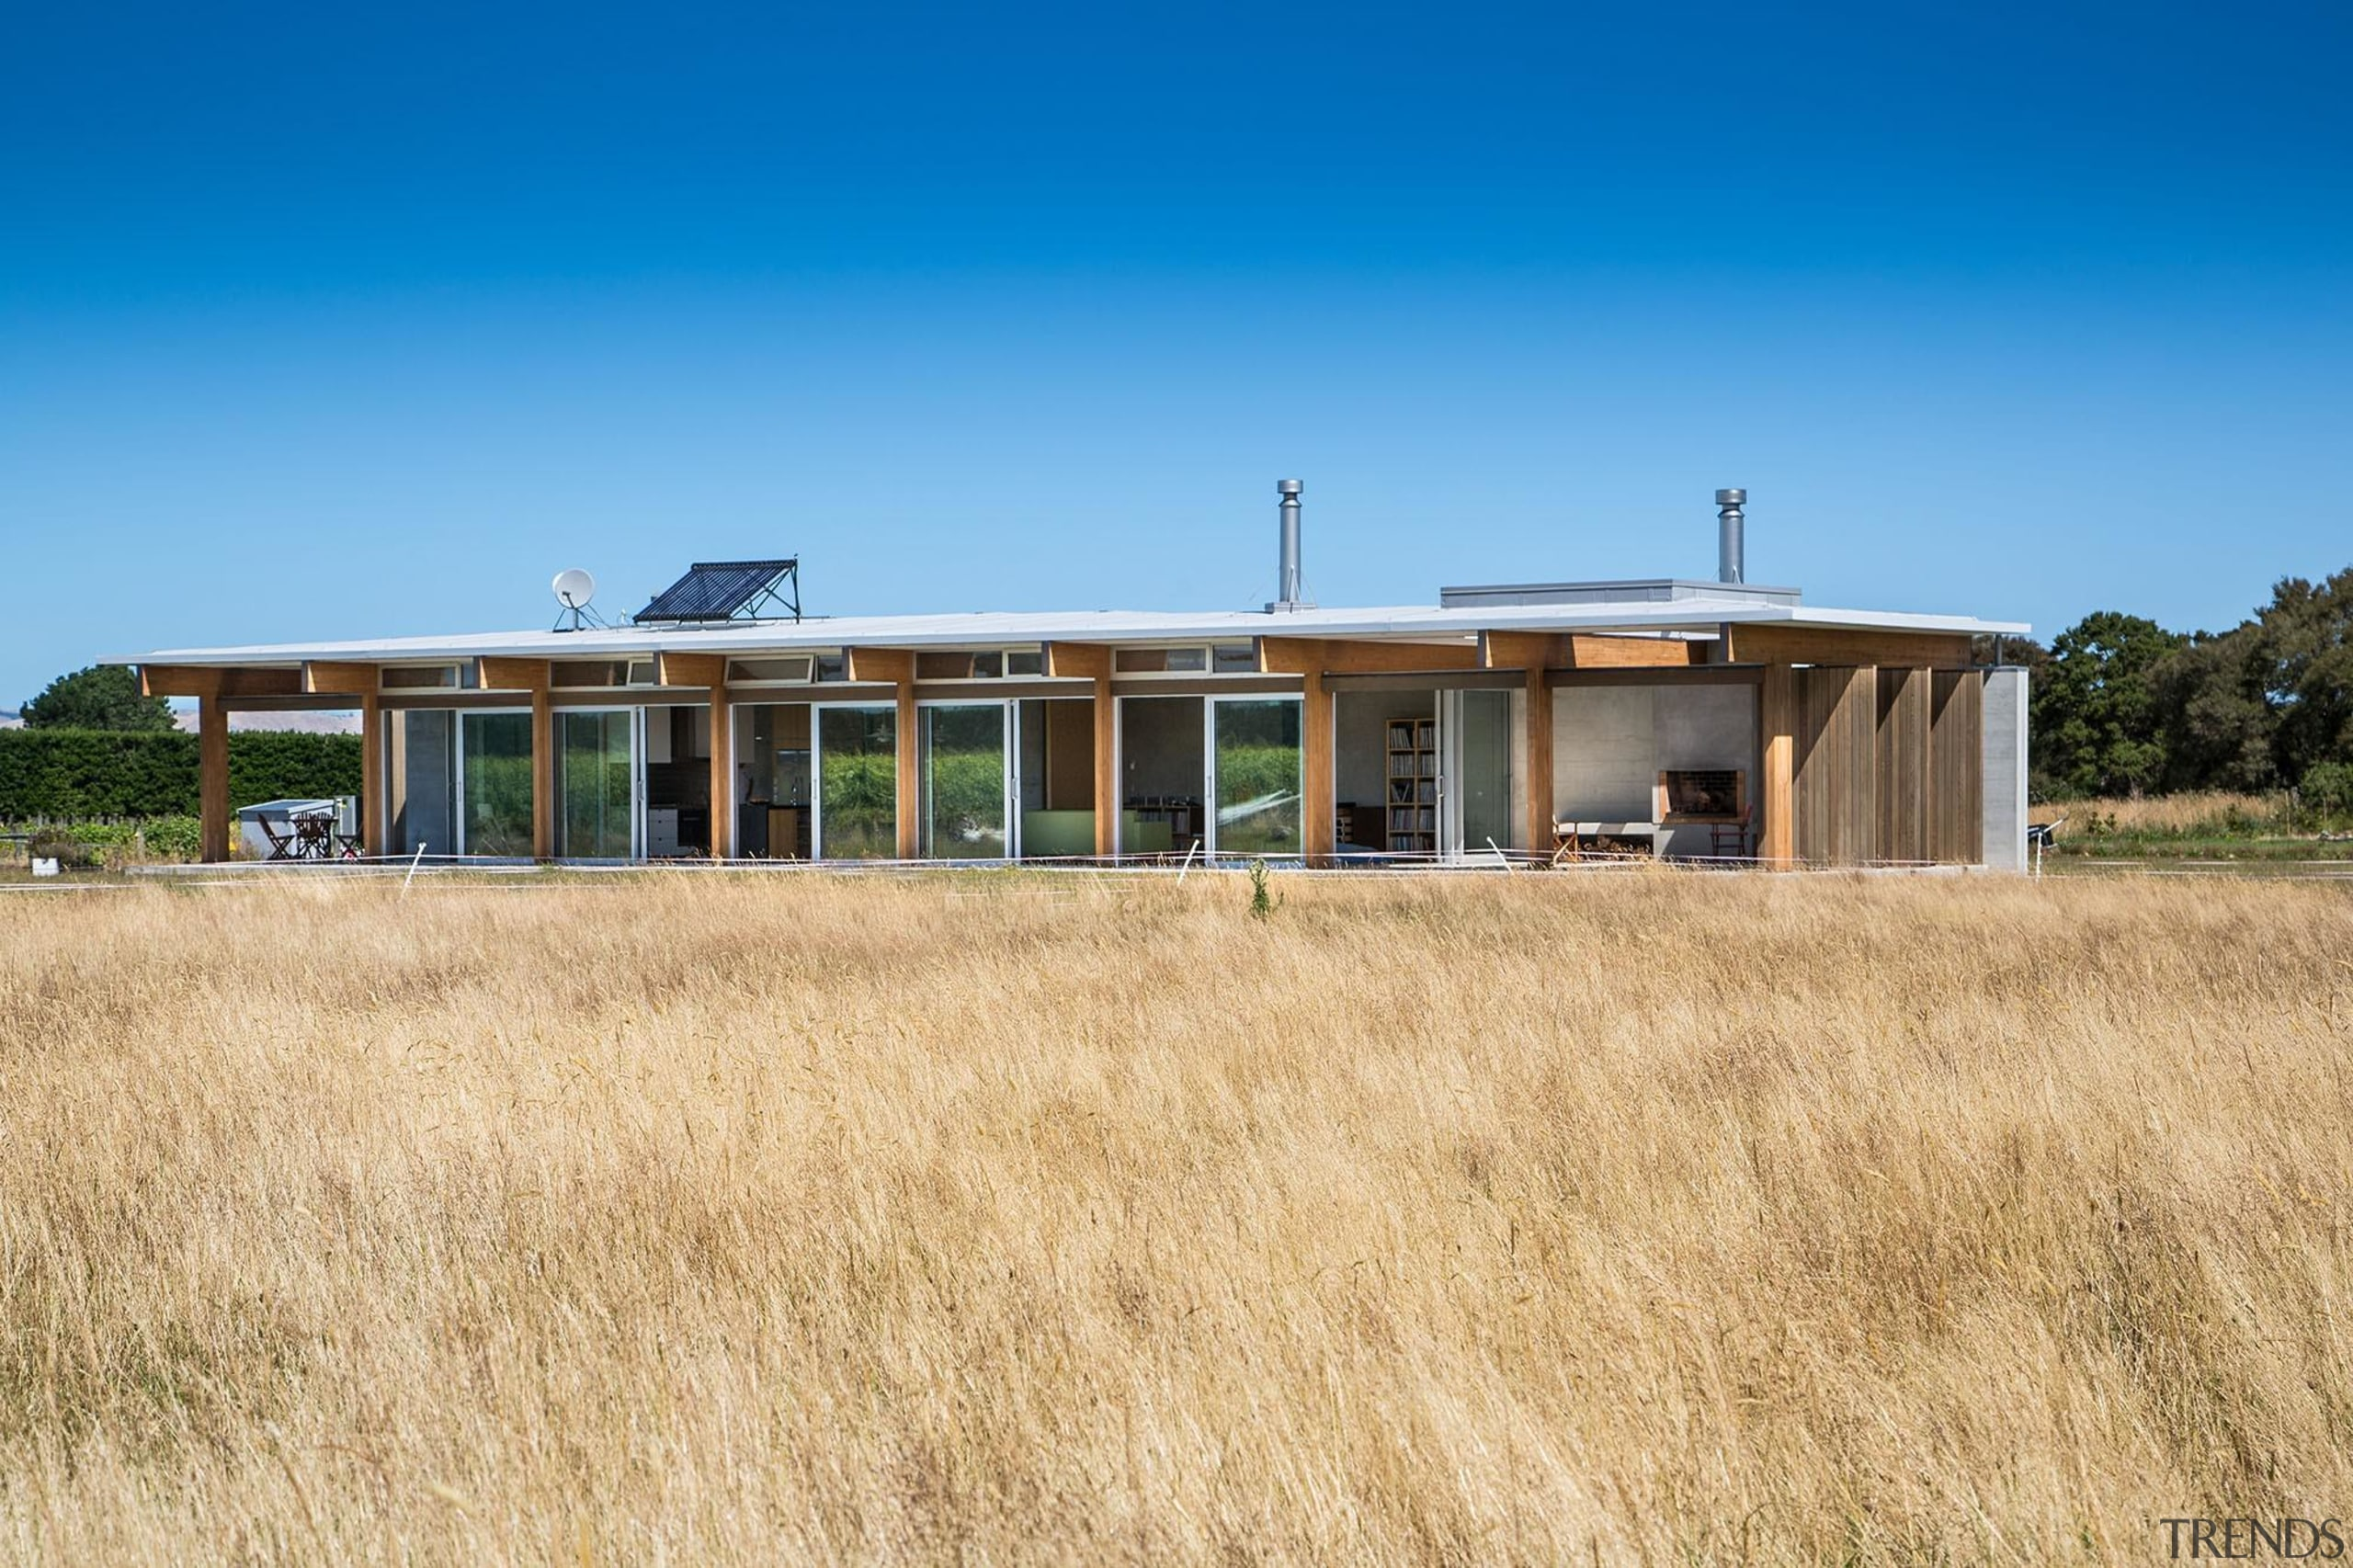 Wellington Architecture Awards cottage, farmhouse, field, home, house, land lot, landscape, prairie, property, real estate, sky, orange